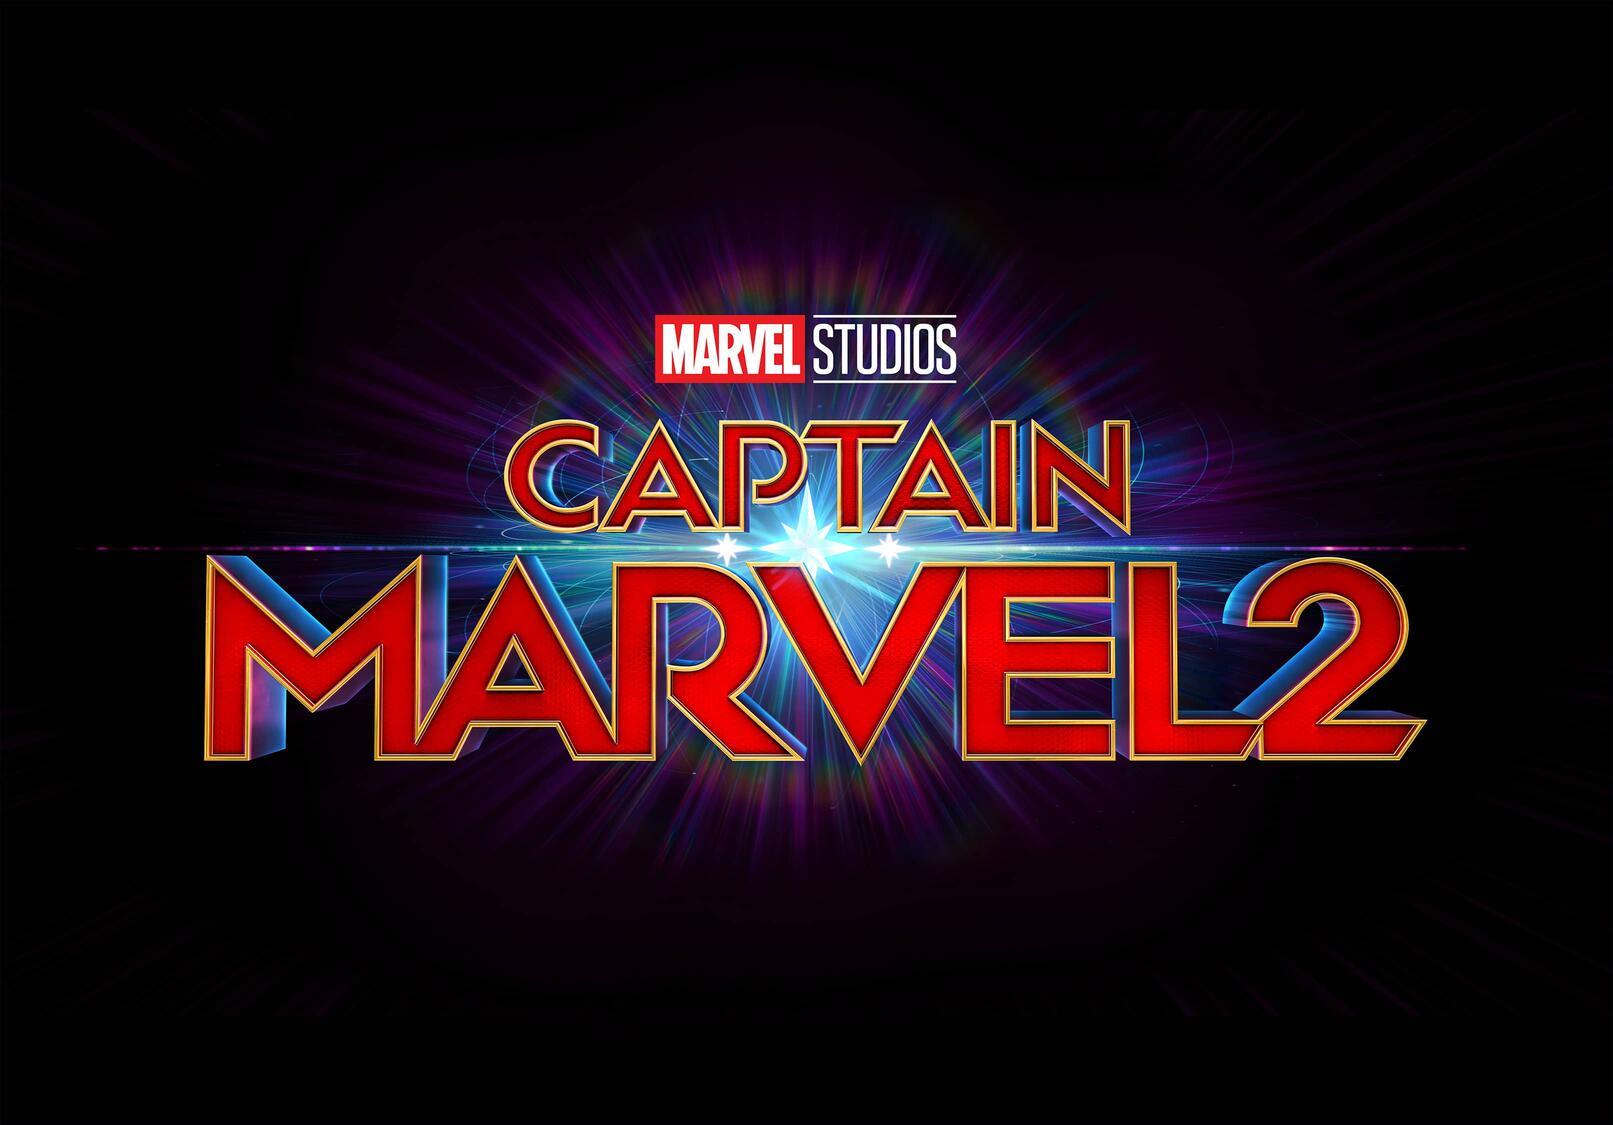 Marvel Studios annunciano Captain Marvel 2